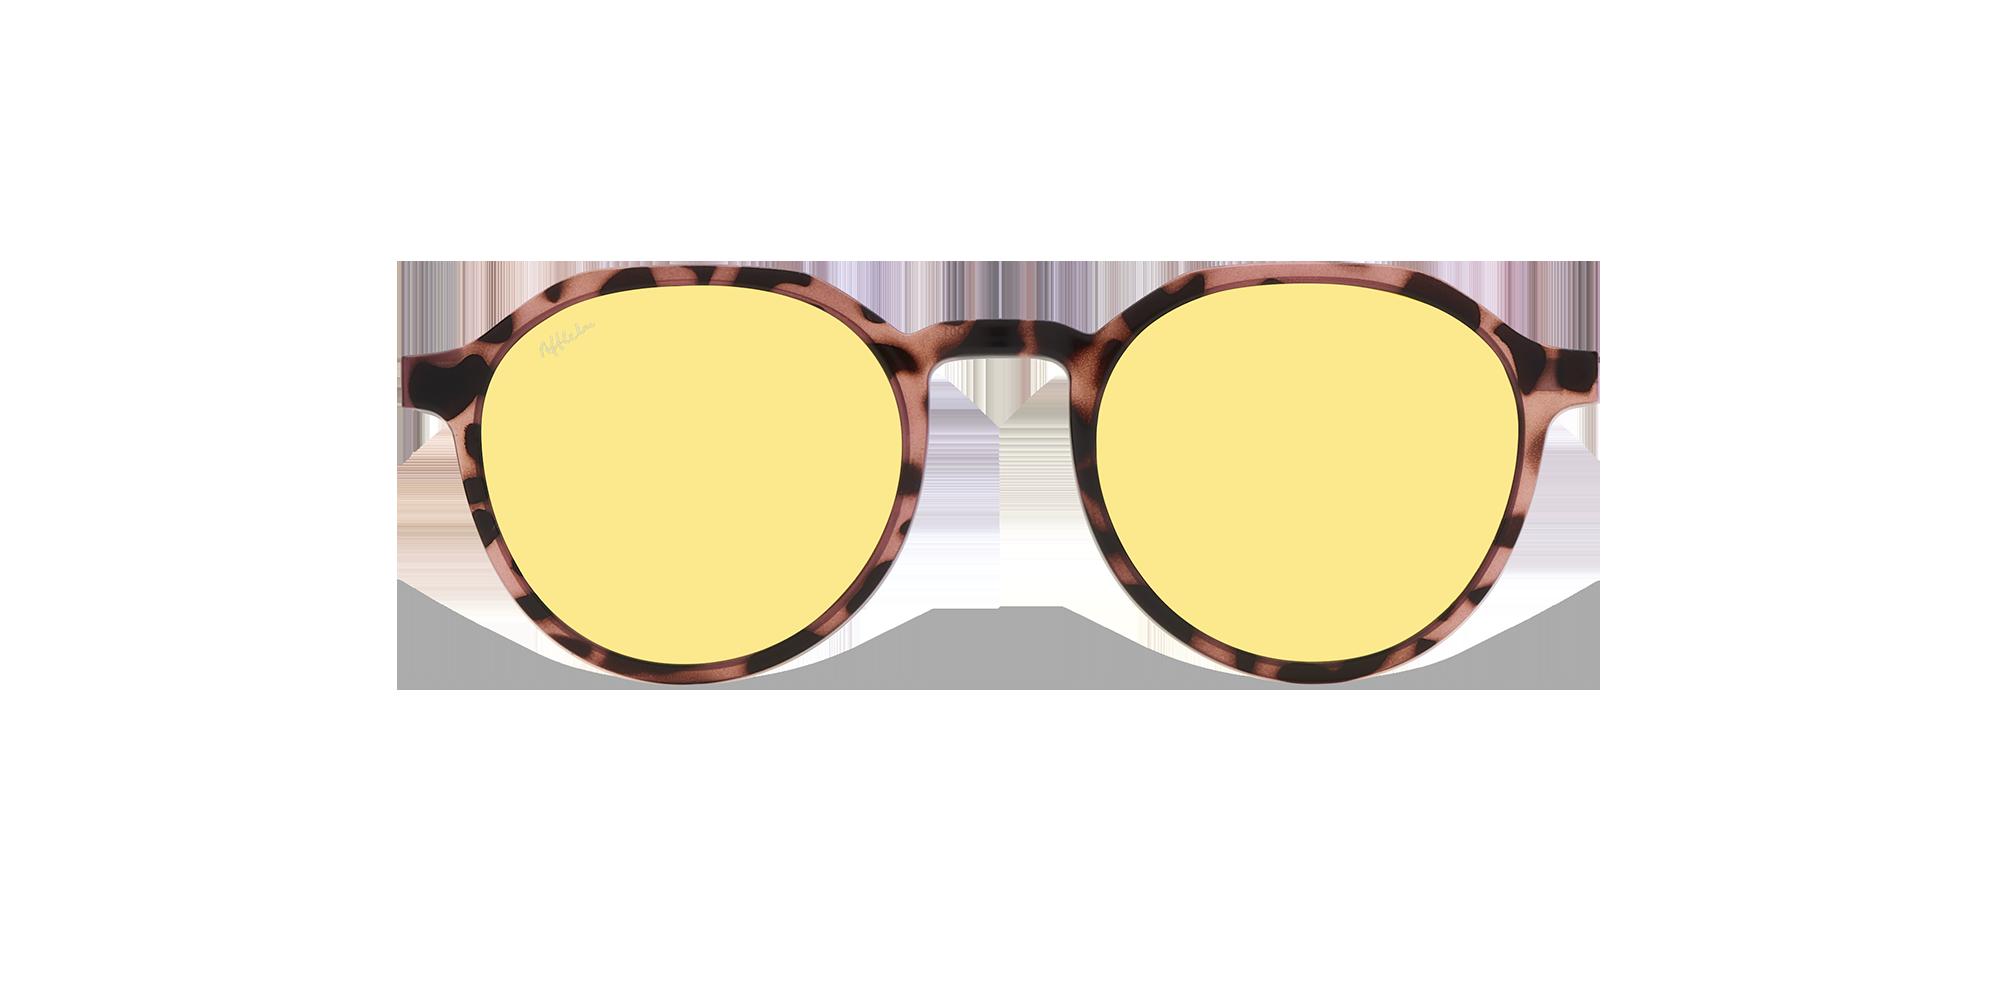 afflelou/france/products/smart_clip/clips_glasses/07630036429051_face.png